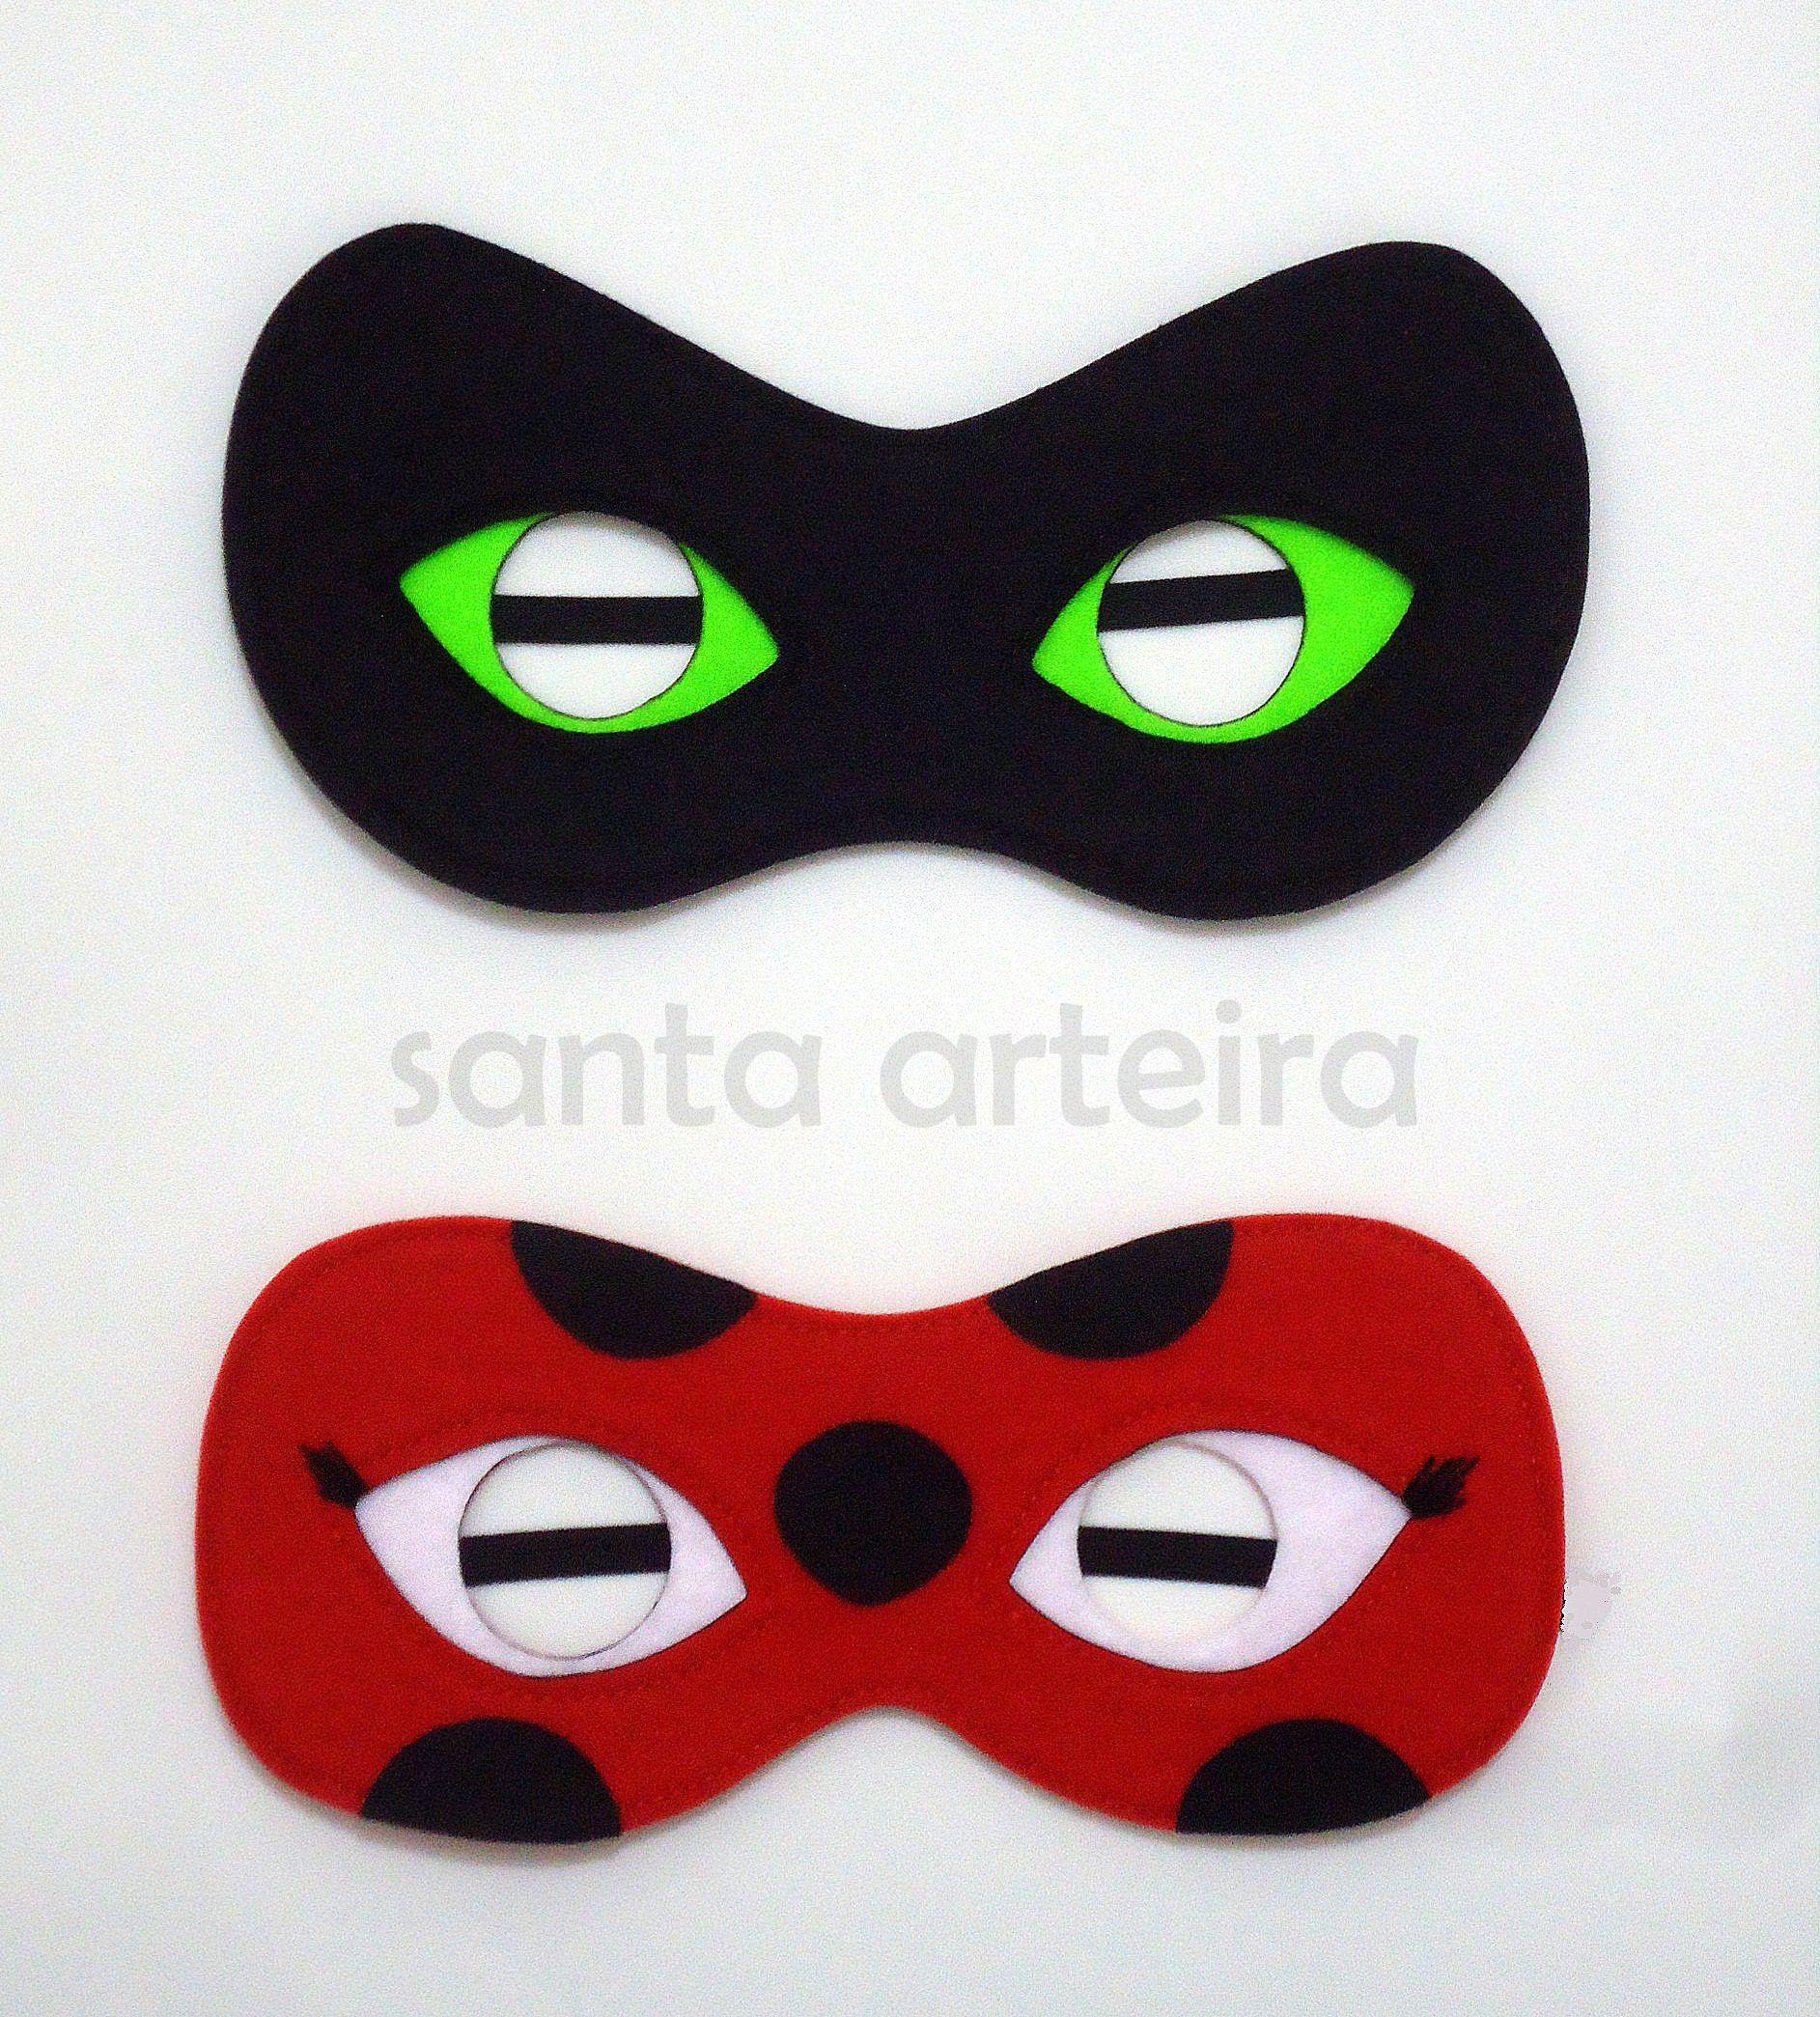 Miraculous Mascara Em Feltro Ladybug E Cat Noir Miraculous Ladybug Catnoir